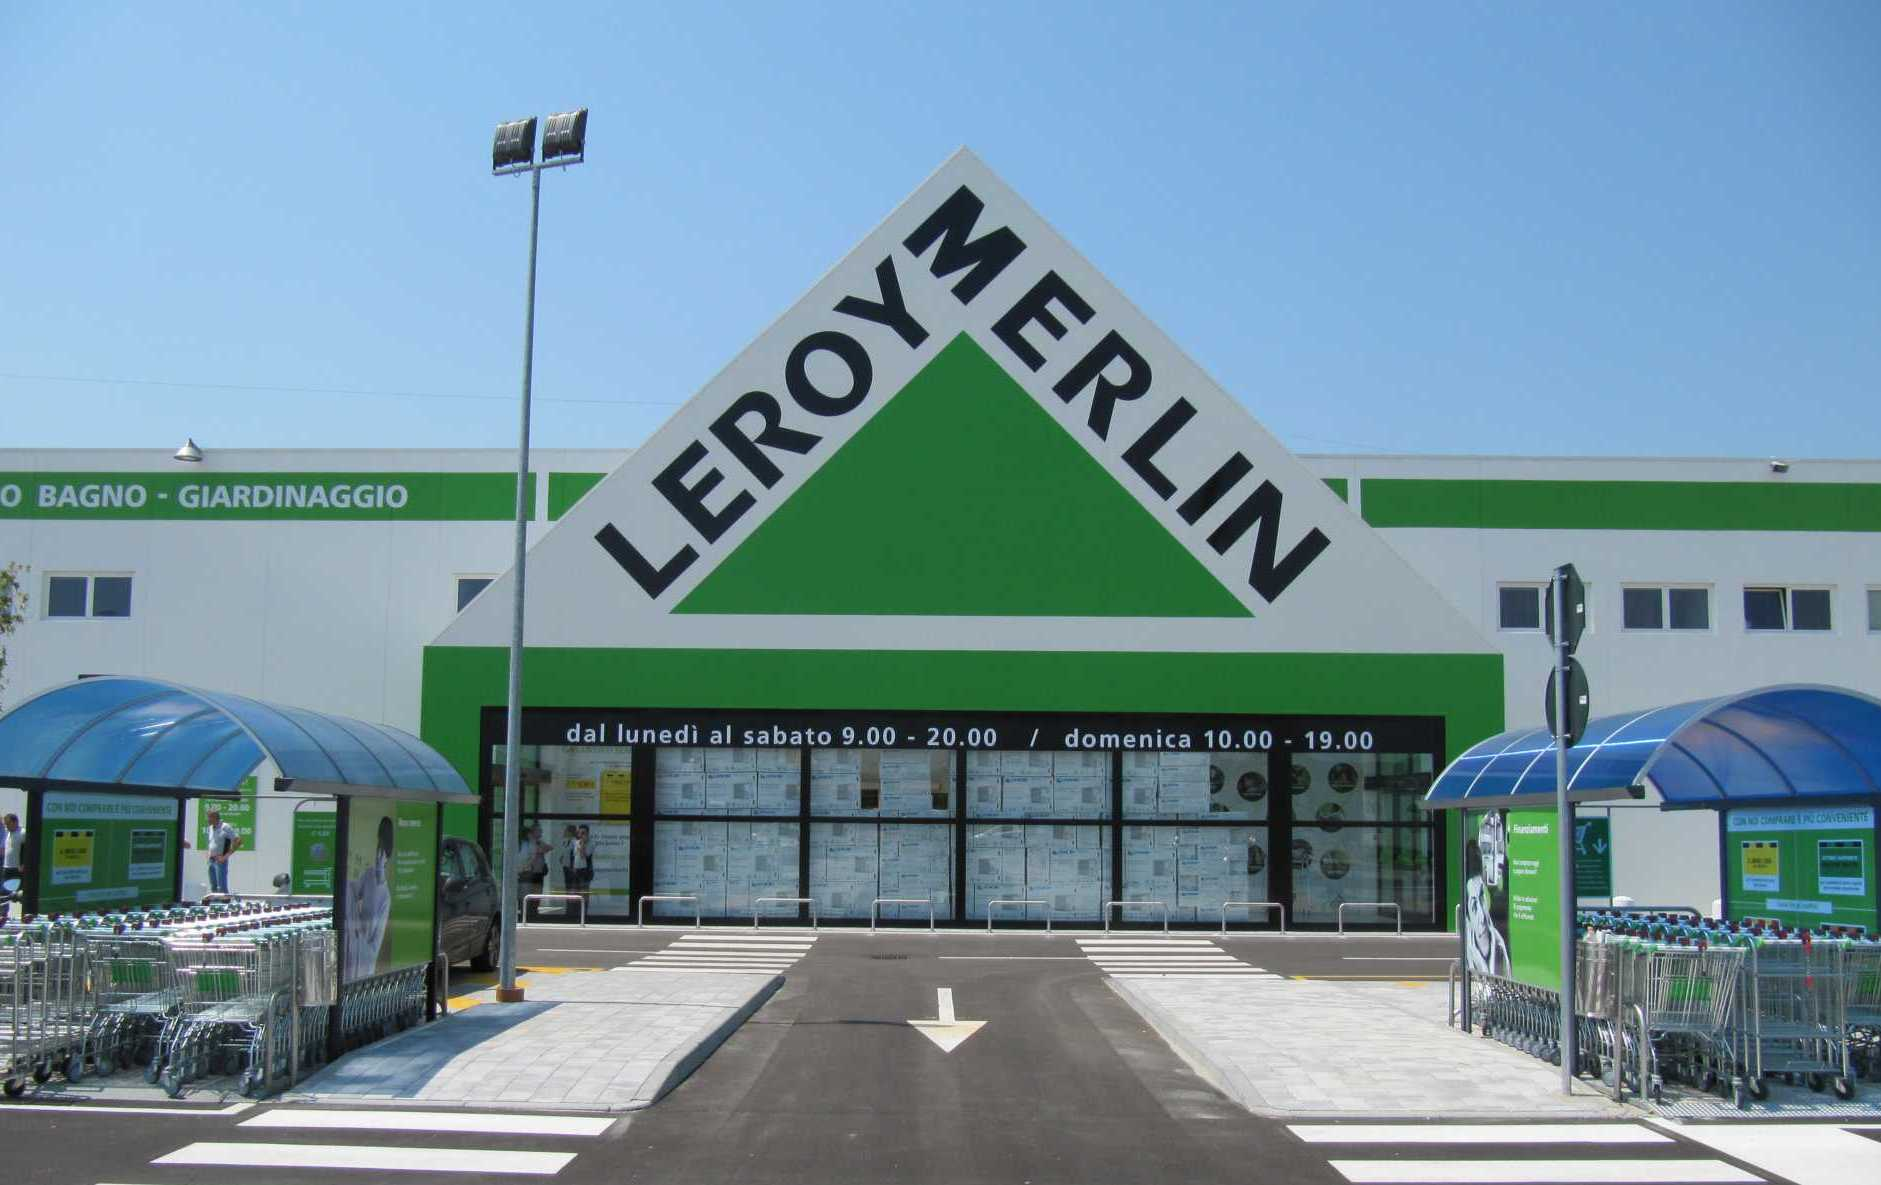 Ecco le foto del nuovo leroy merlin di udine for Abat jour leroy merlin